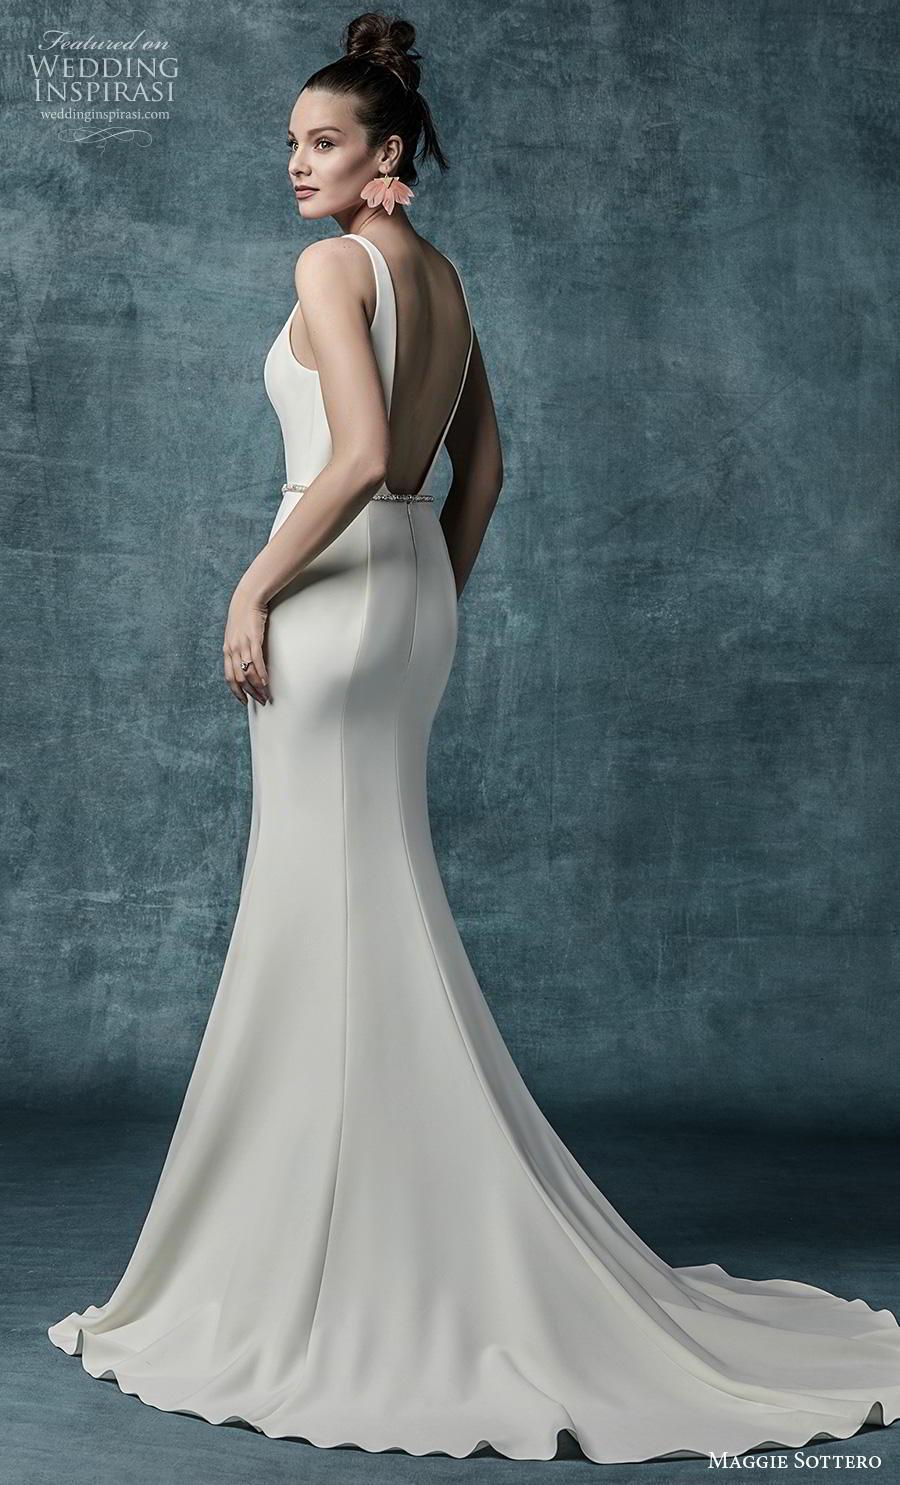 maggie sottero spring 2019 bridal sleeveless bateau neckline simple minimalist elegant fit and flare wedding dress backless low back medium train (15) bv